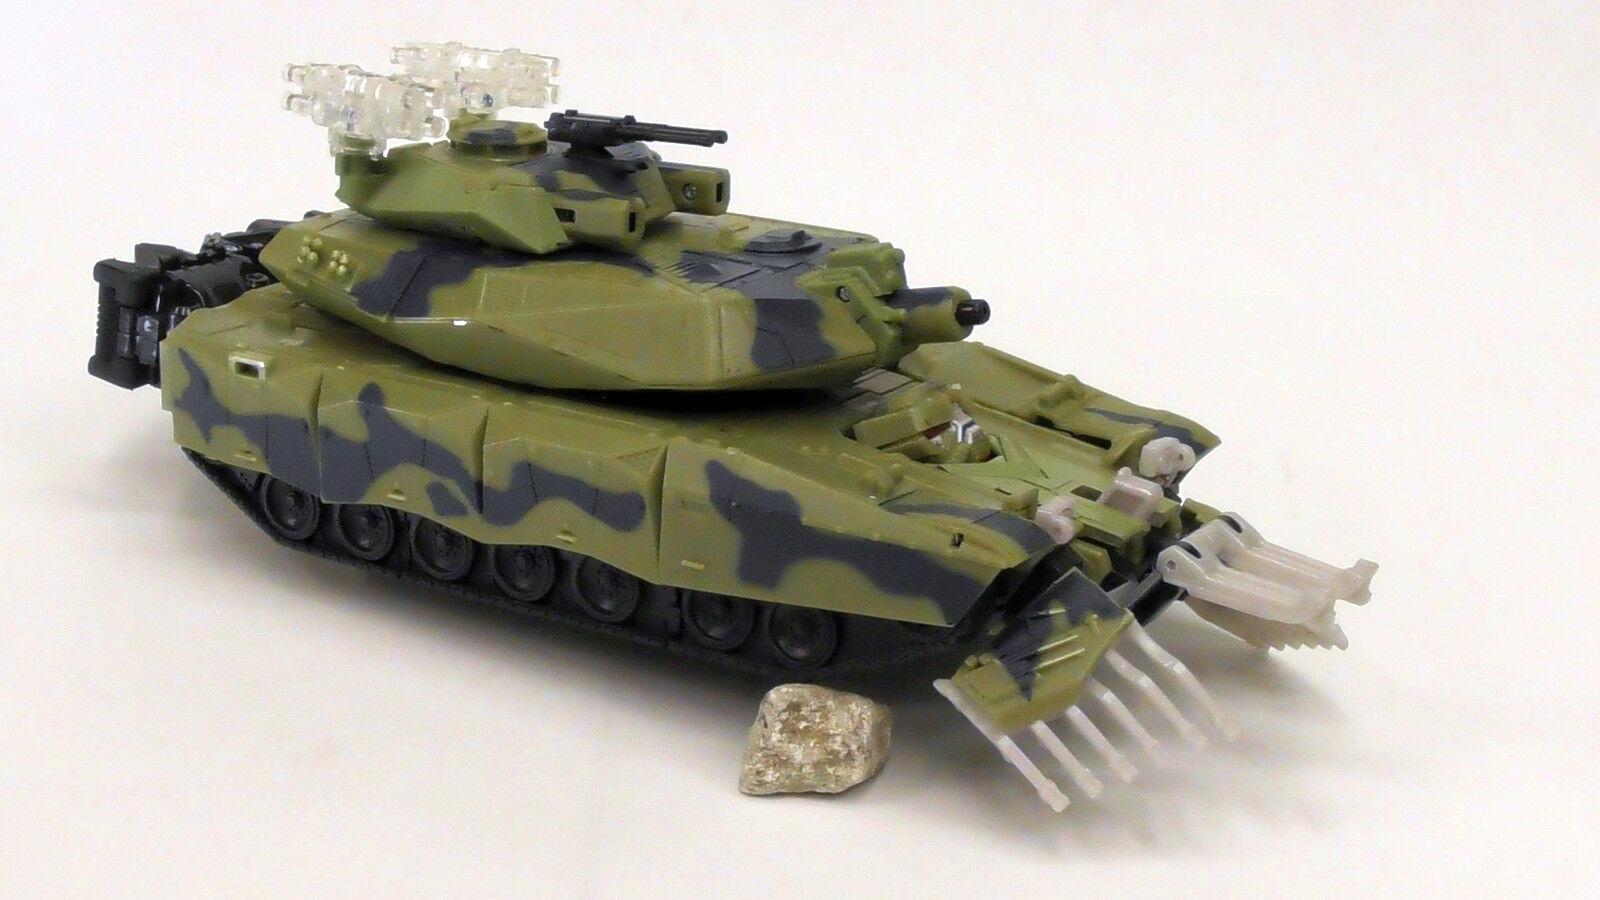 TRANSFORMERS MOVIE Leader Class DECEPTICON BRAWL Tank Action Figure 2007